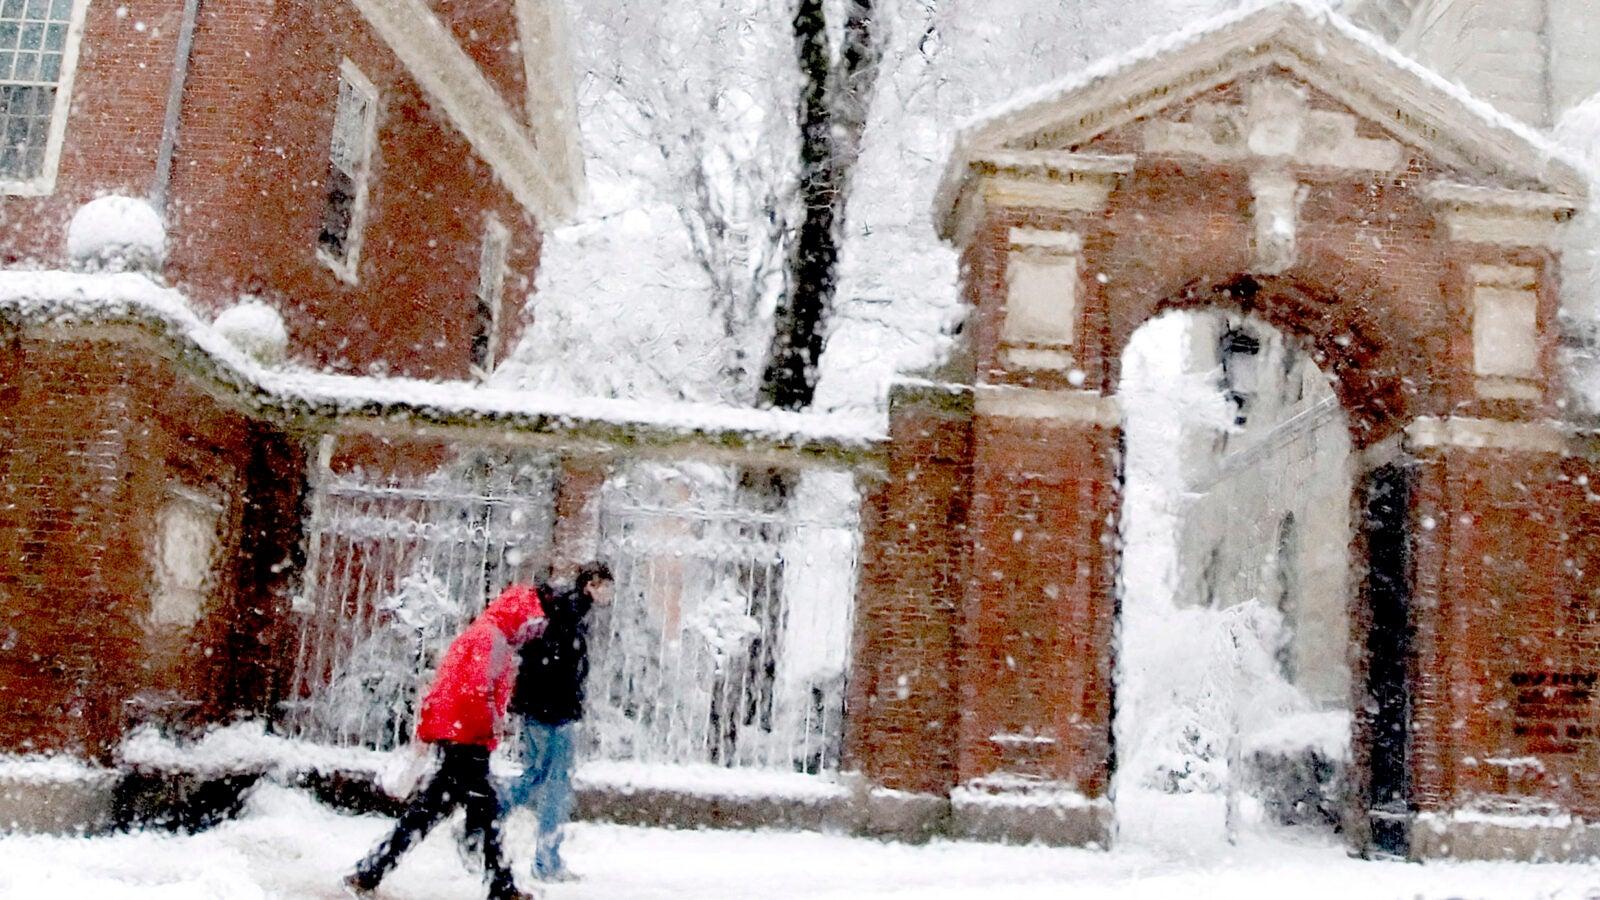 Snowy day in 2007.